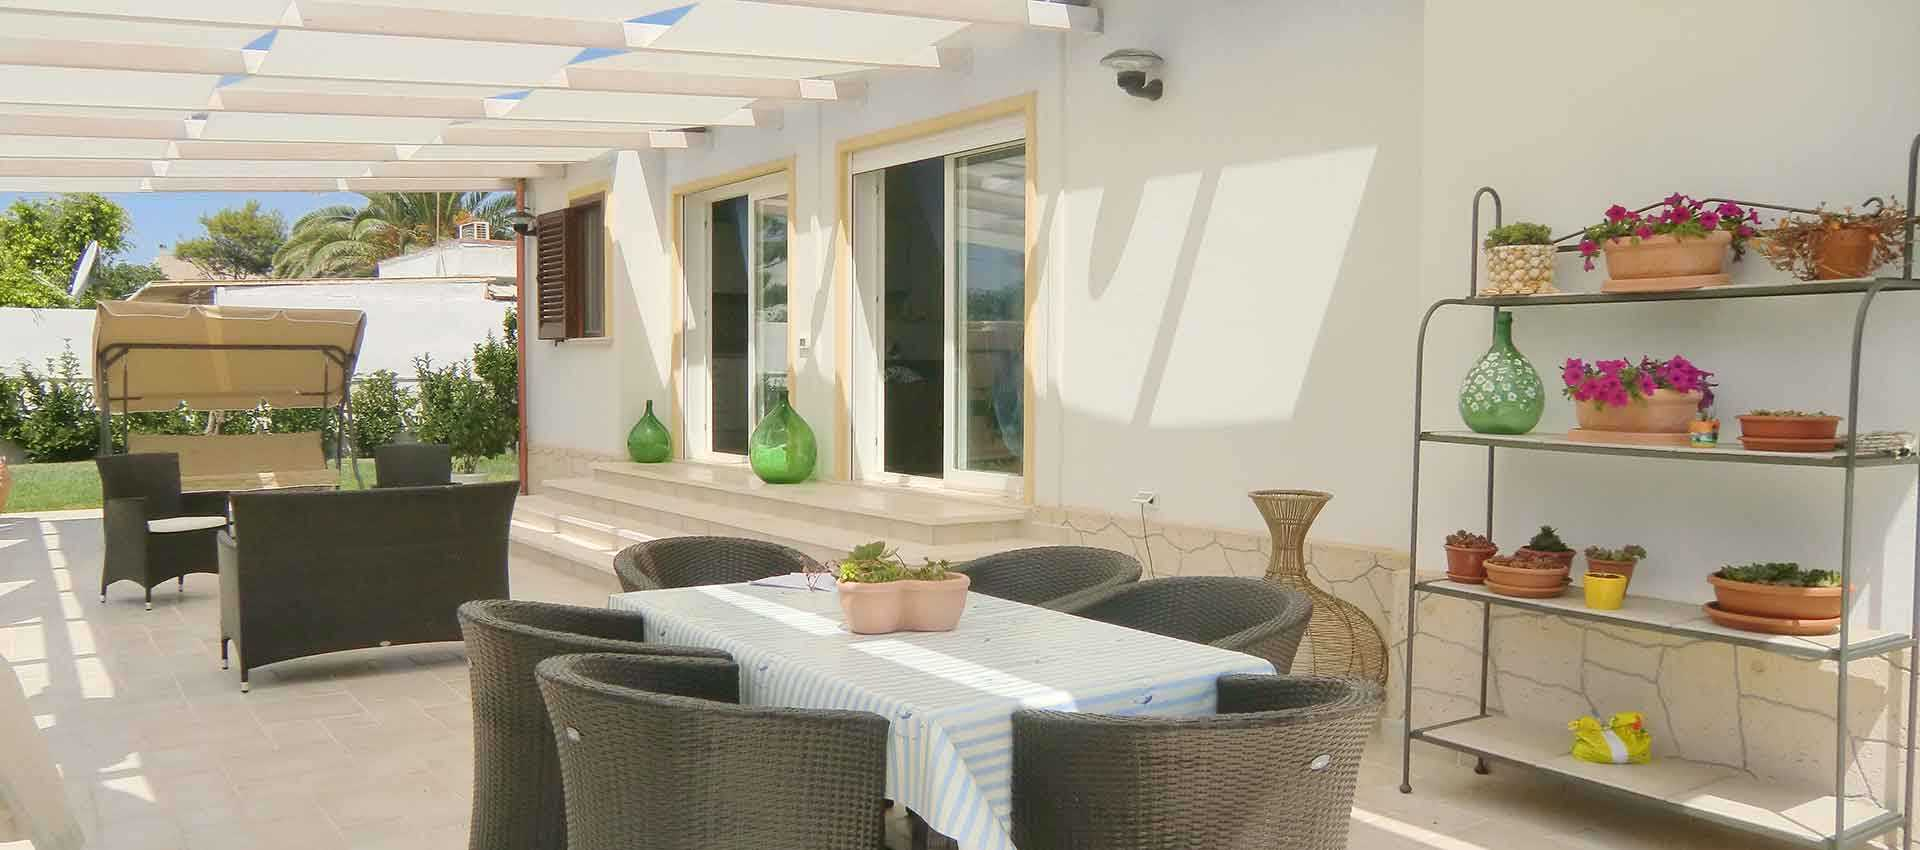 Casa prefabbricata villa anna sib case for Casa prefabbricata 40 mq